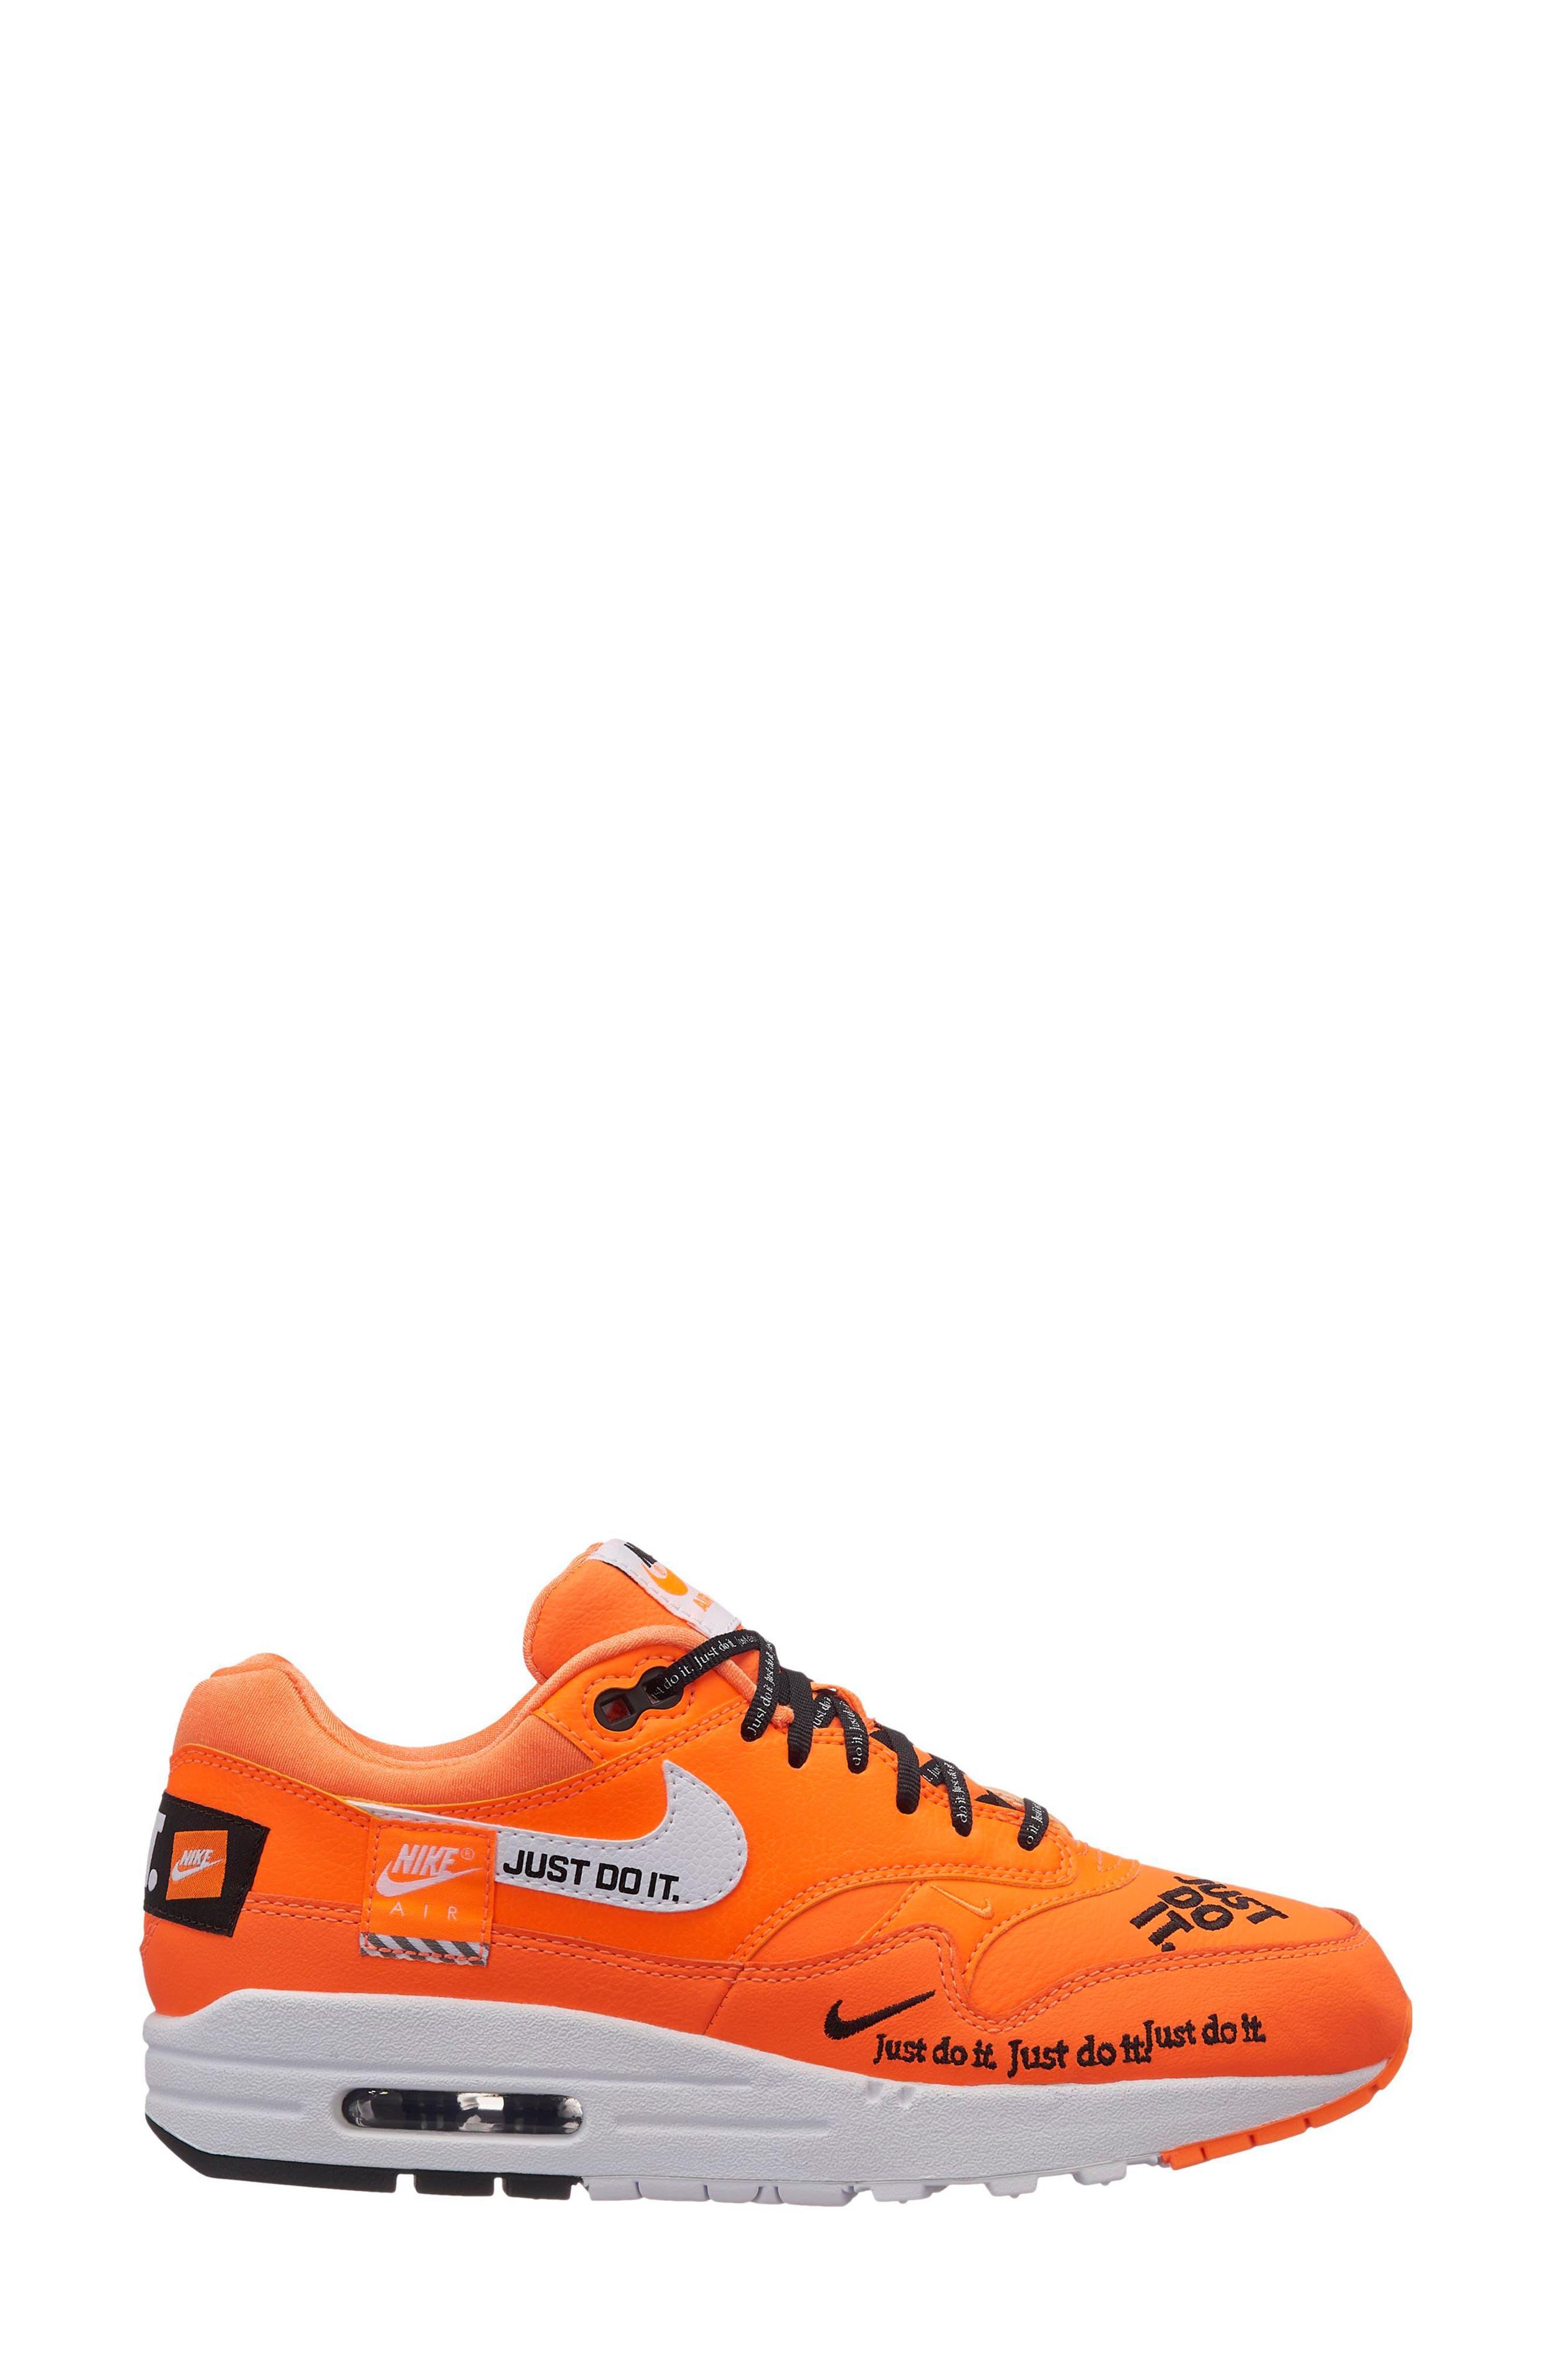 Air Max 1 Lux Sneaker,                         Main,                         color, Total Orange/ White-Black